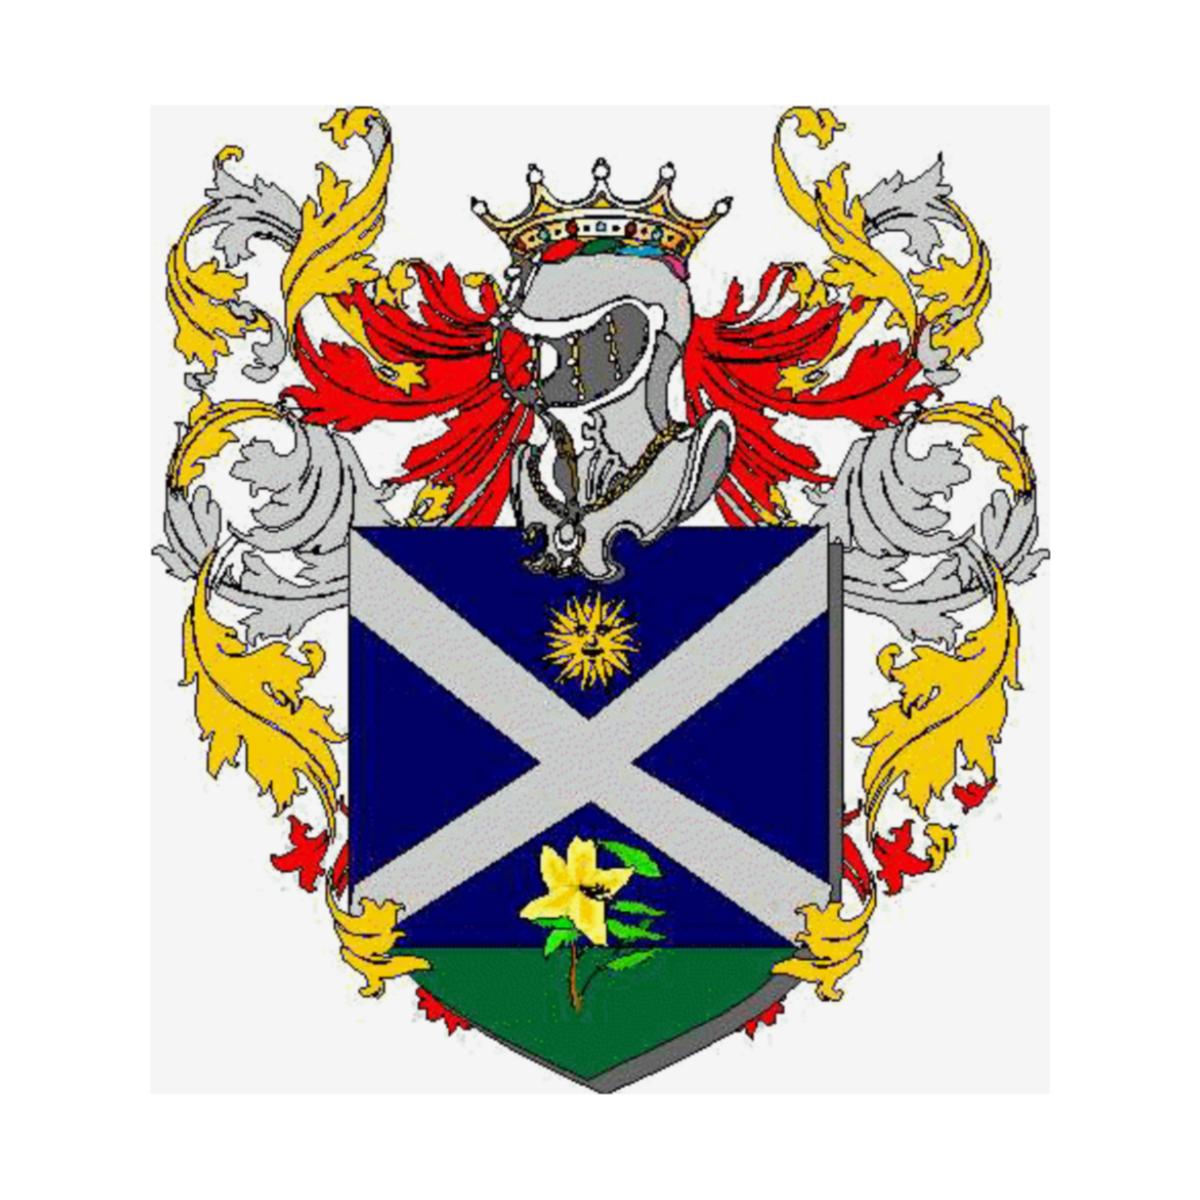 Mistruzzi Di Frisinga Coat of arms, Last name Origin, Herald